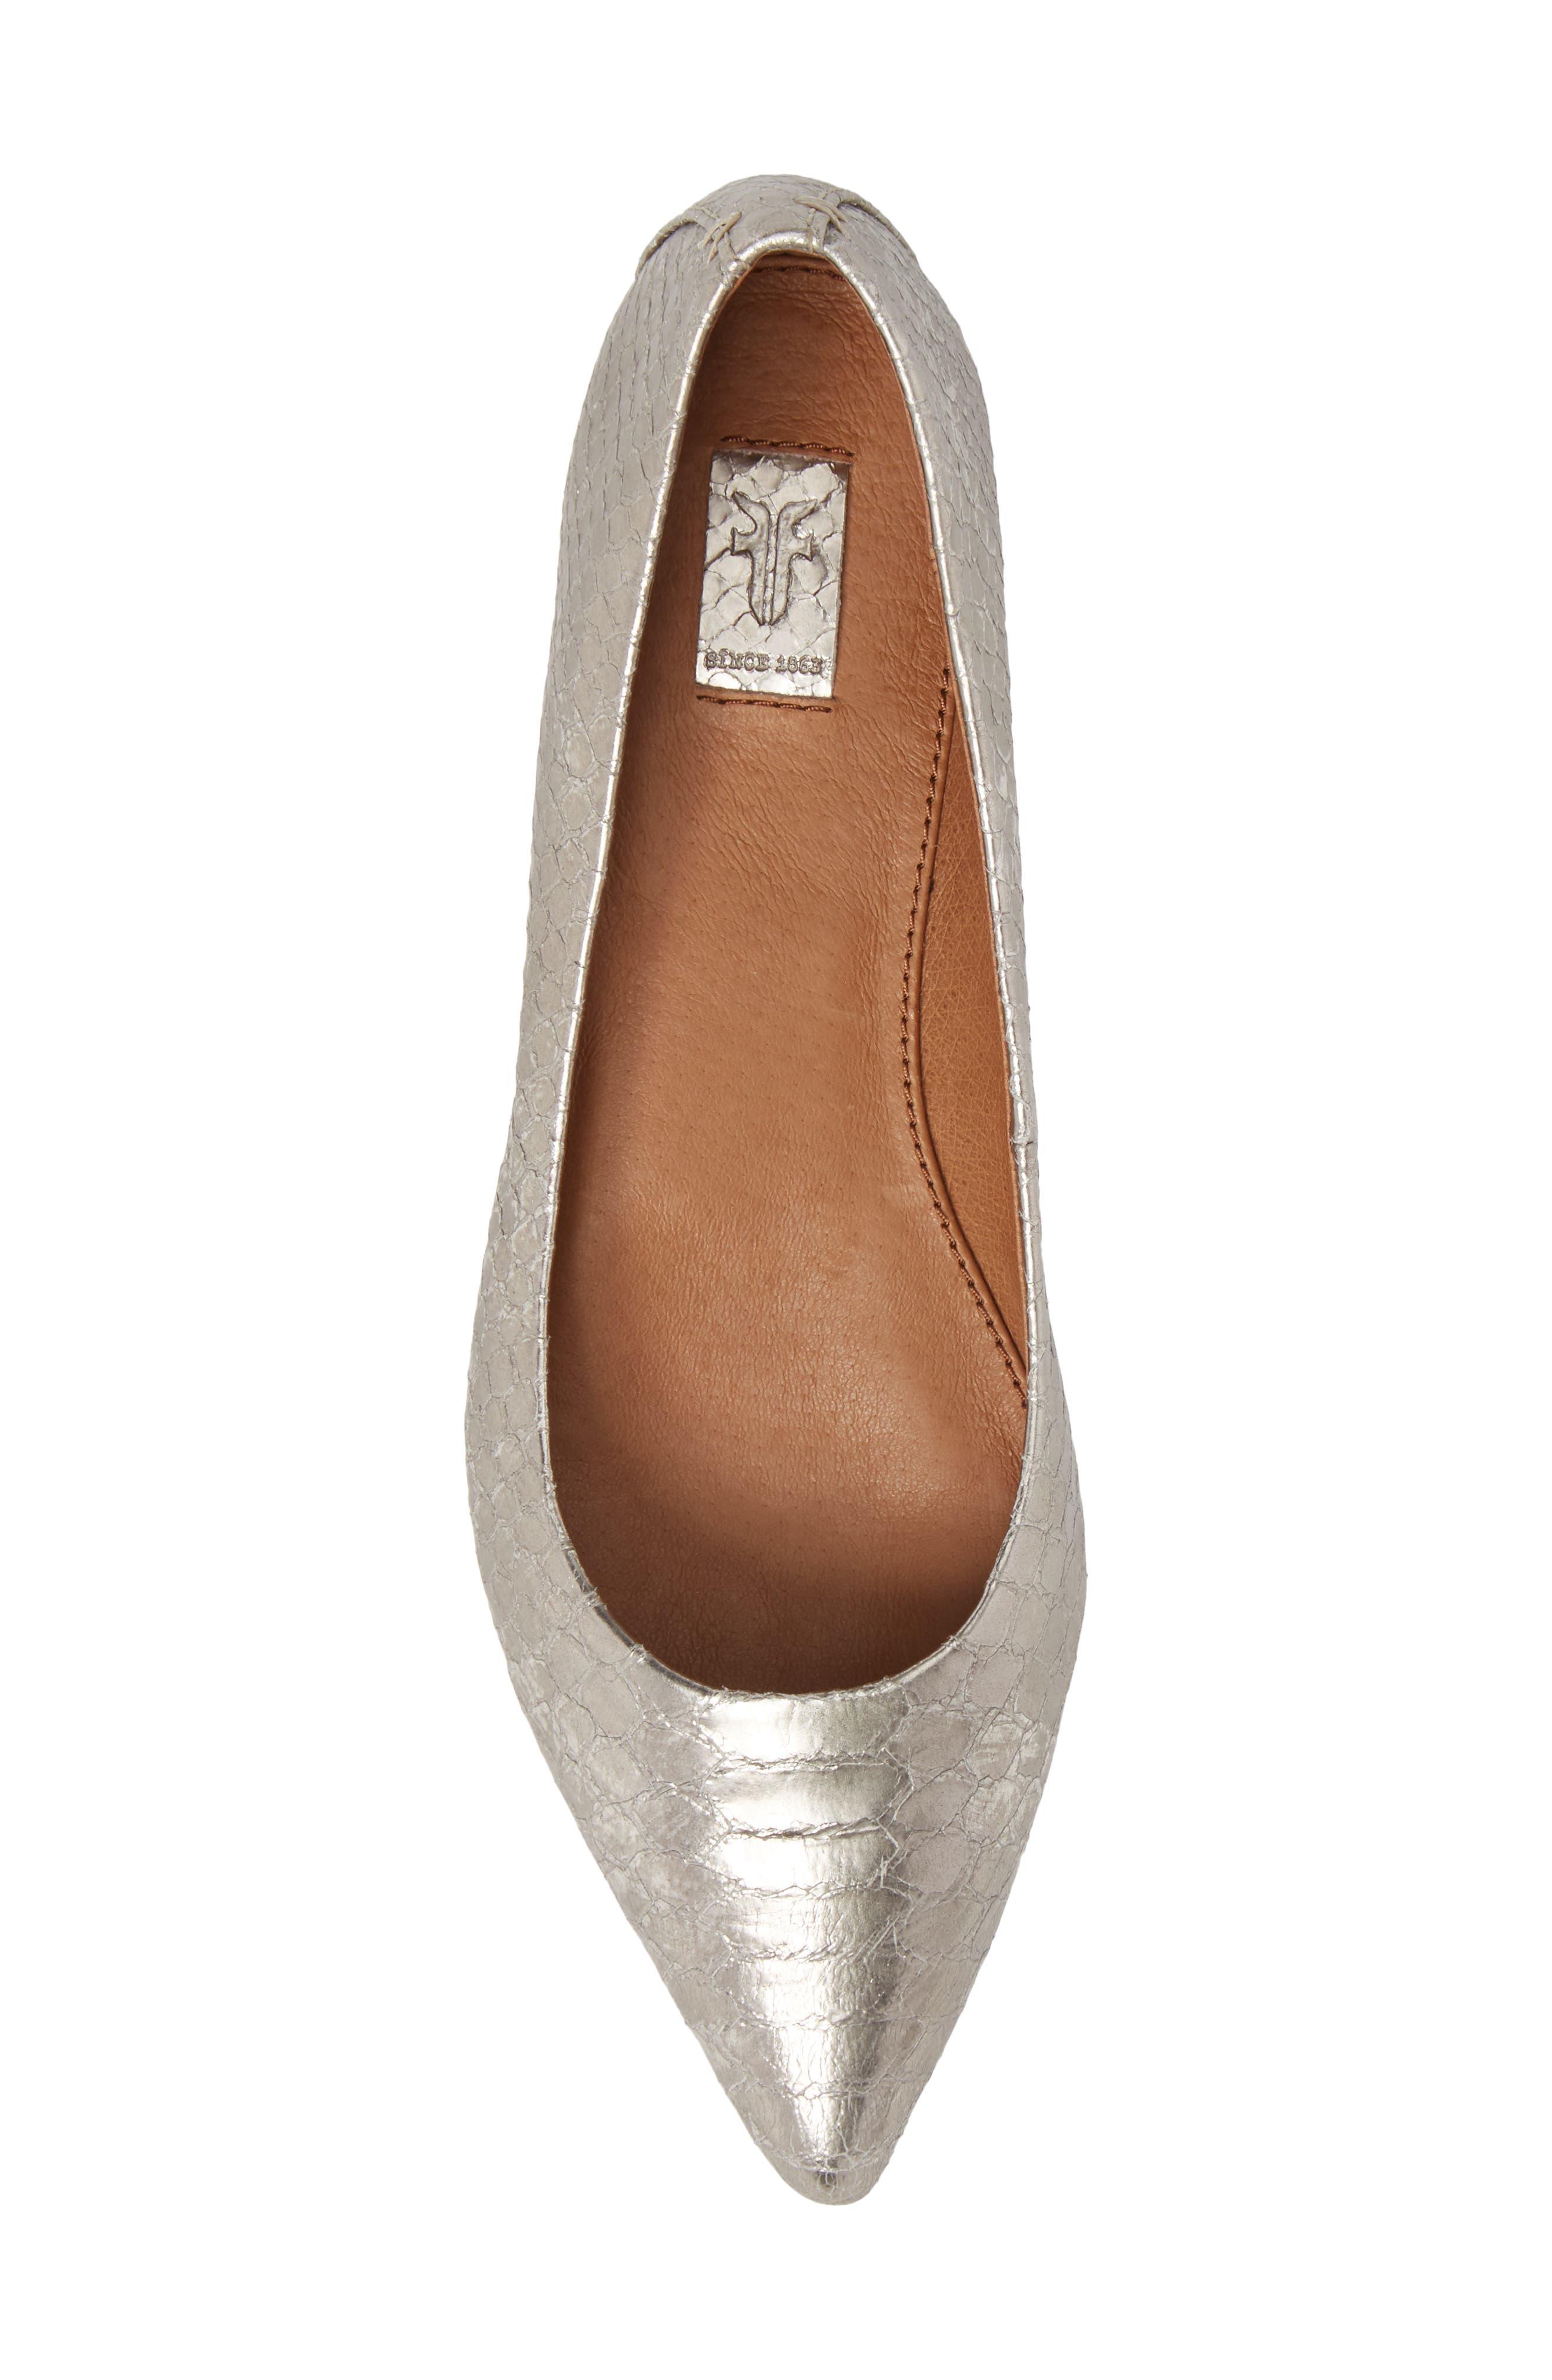 Sienna Pointy Toe Ballet Flat,                             Alternate thumbnail 13, color,